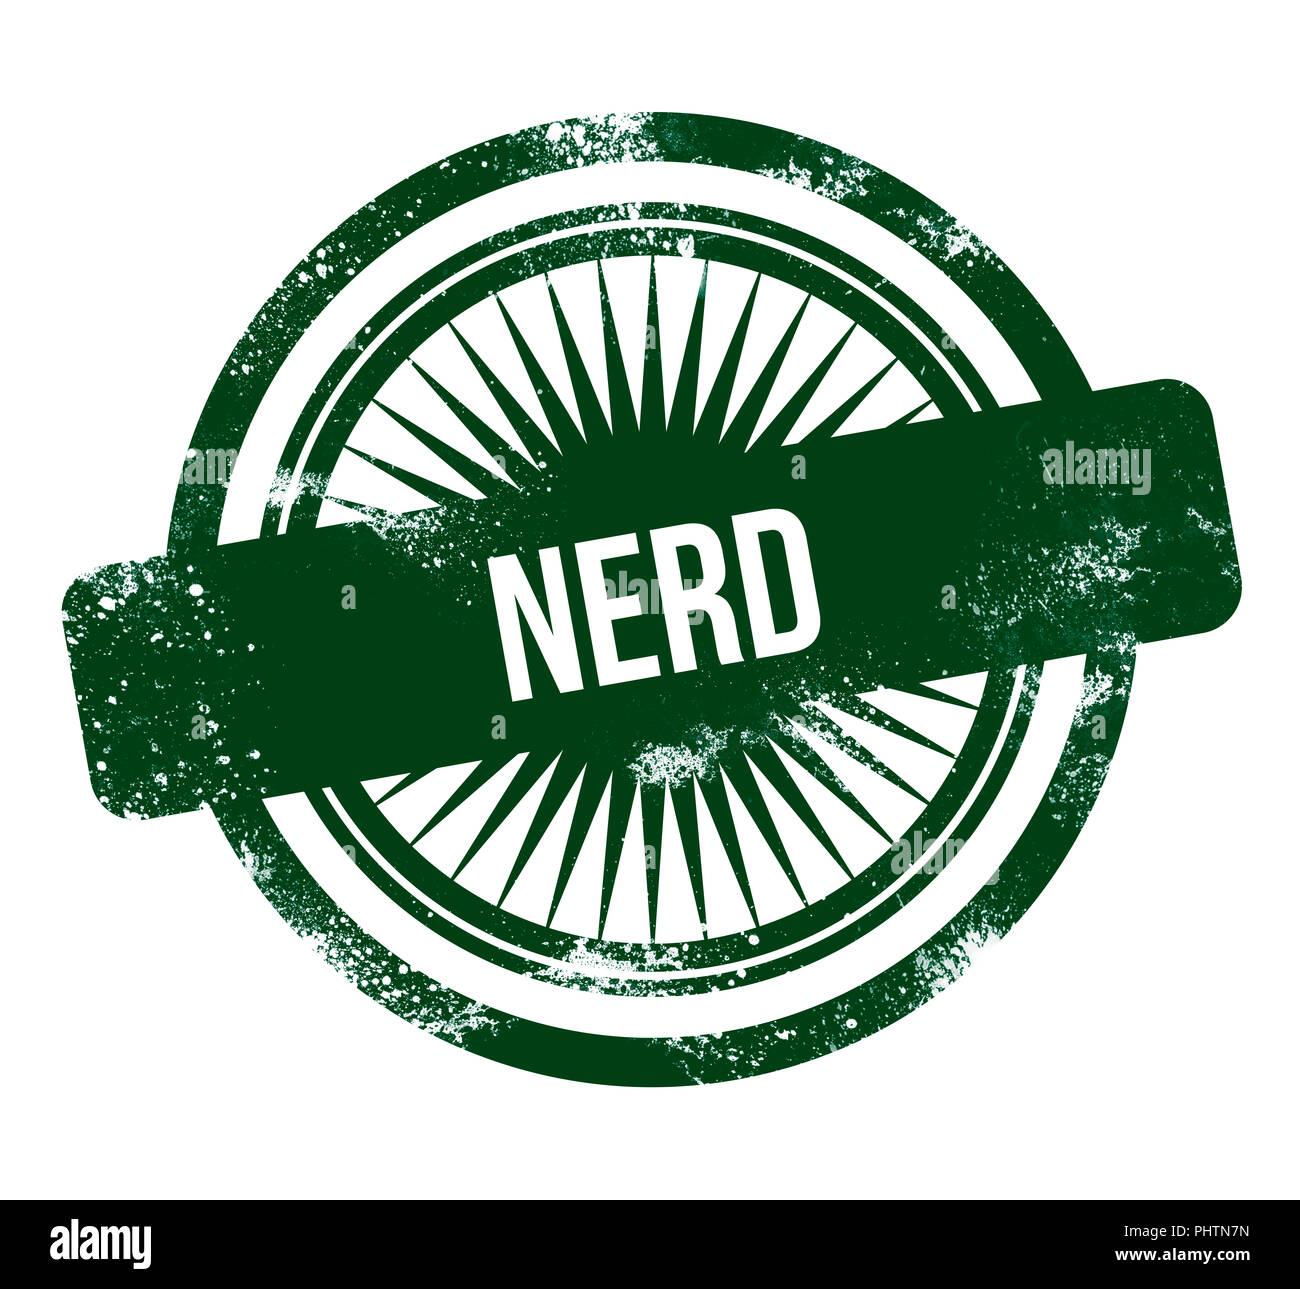 nerd - green grunge stamp - Stock Image